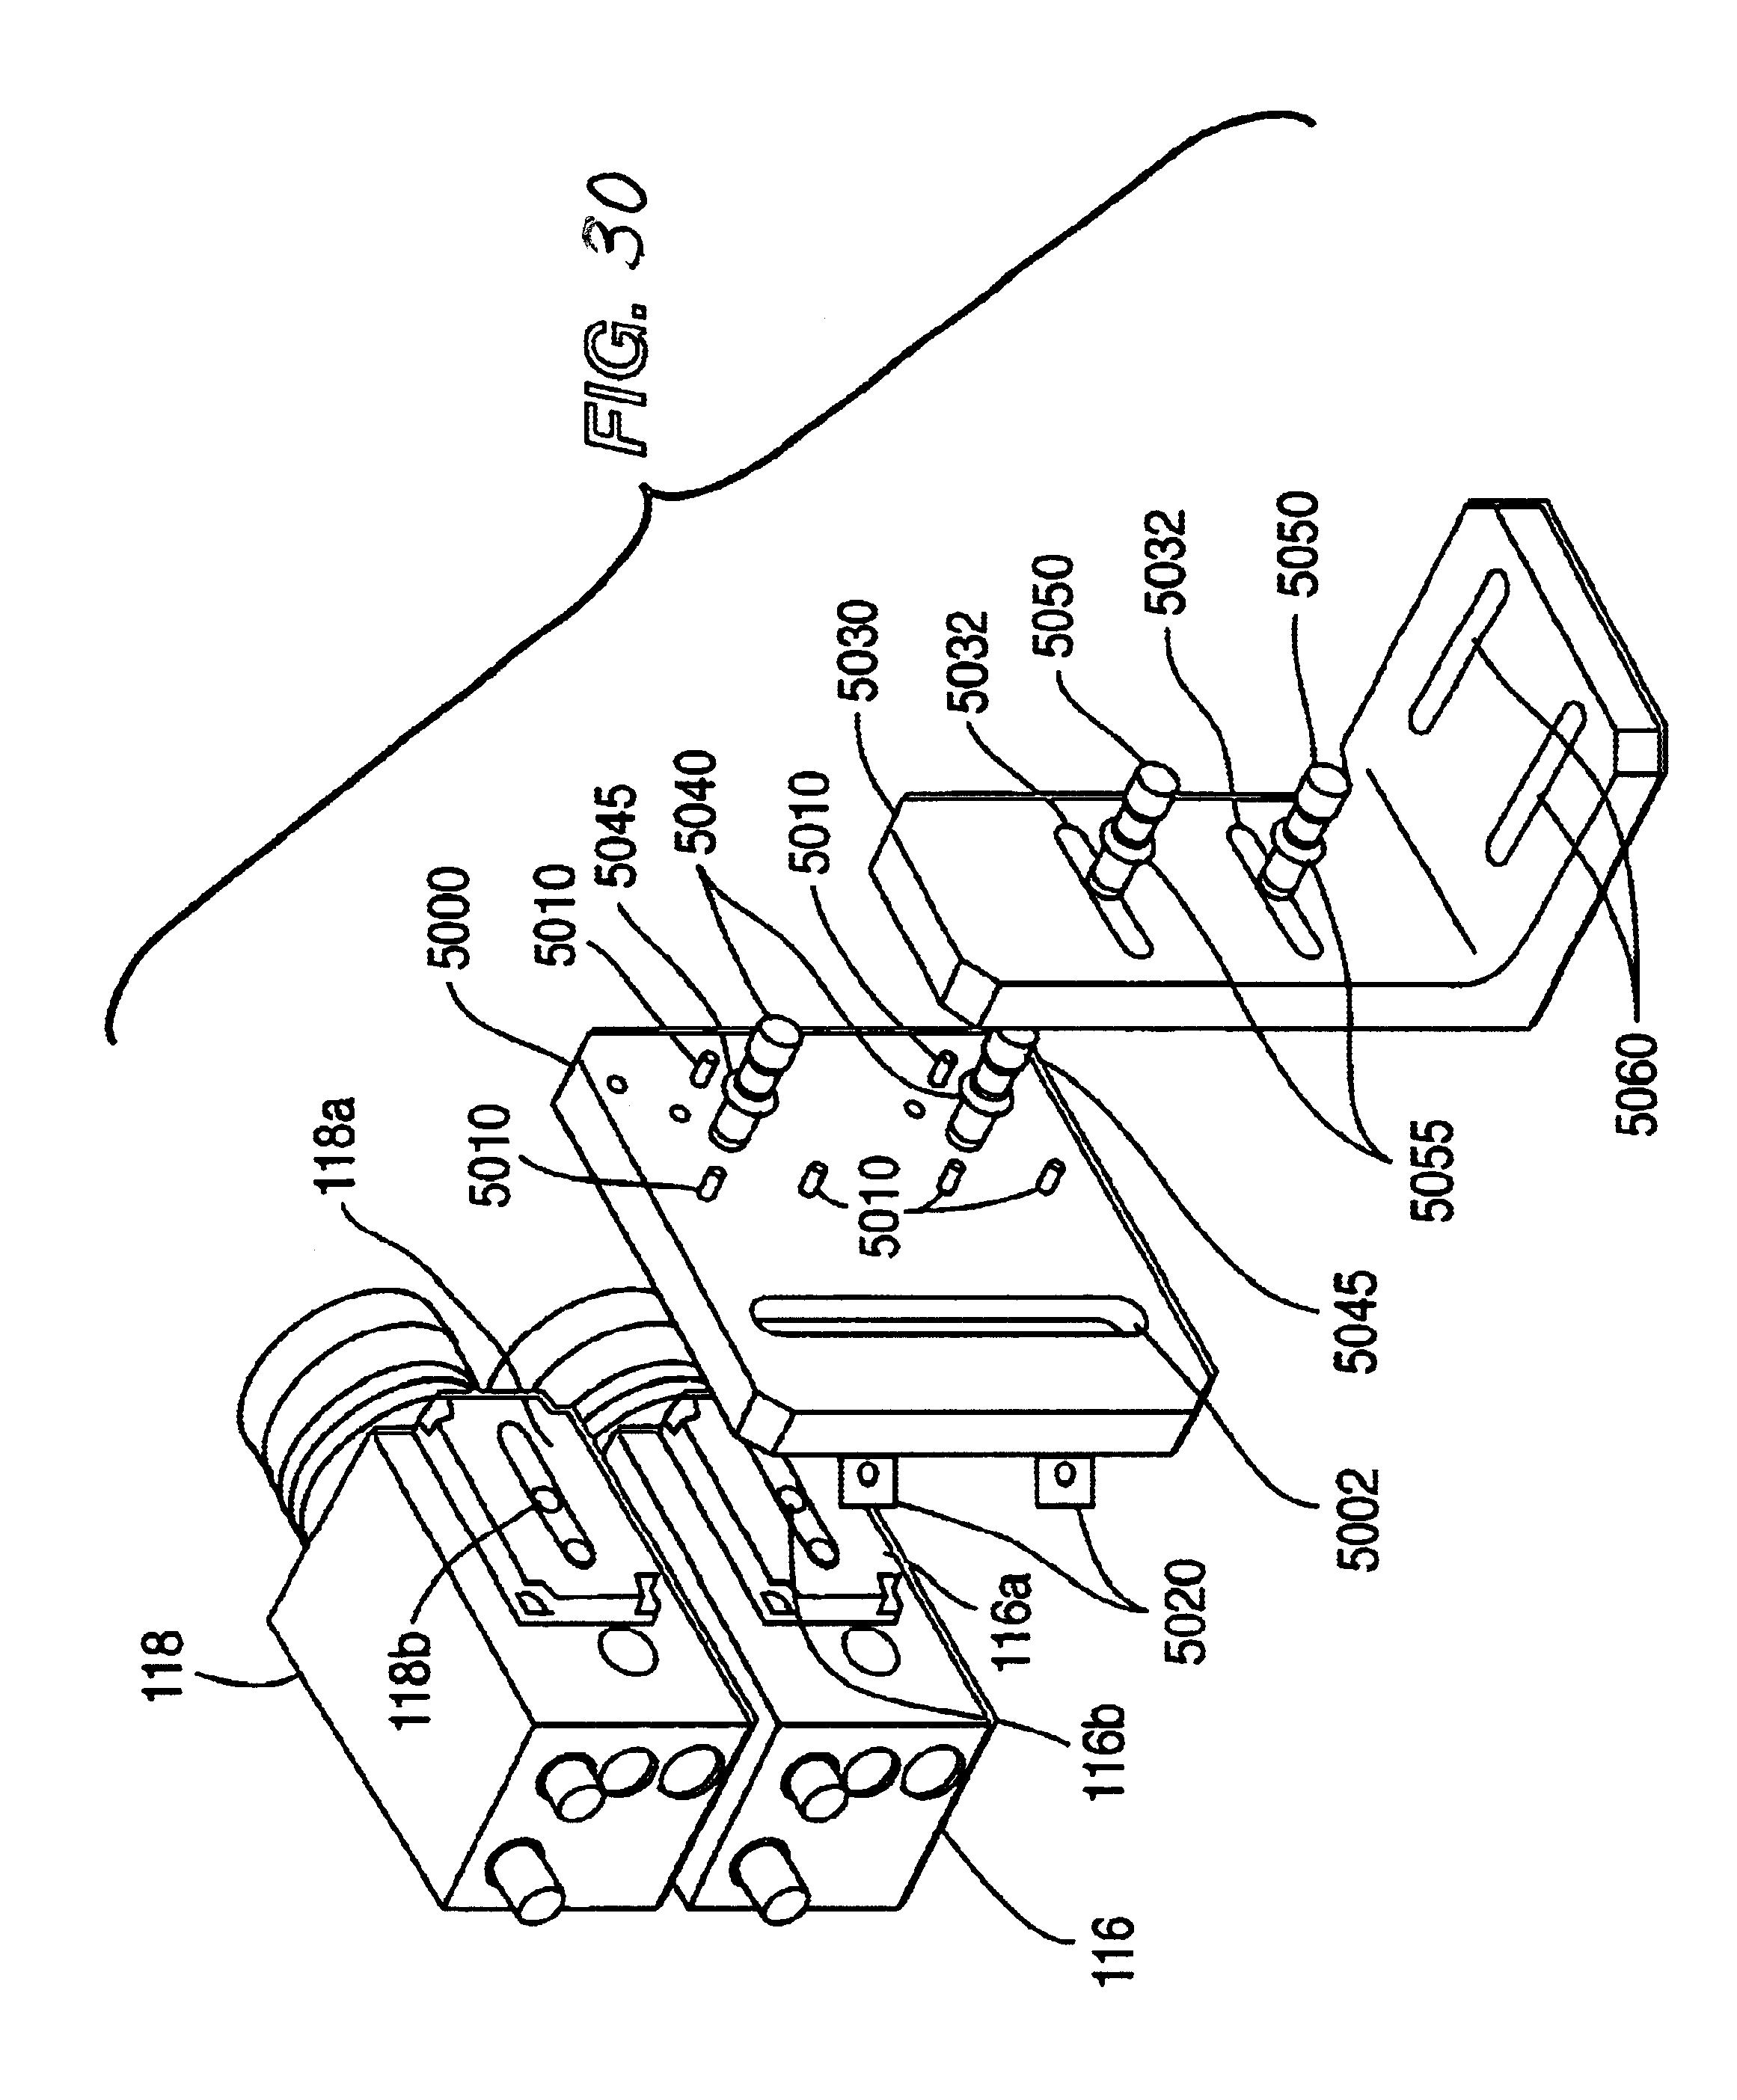 patent us 6 714 665 b1 International Pickup patent images